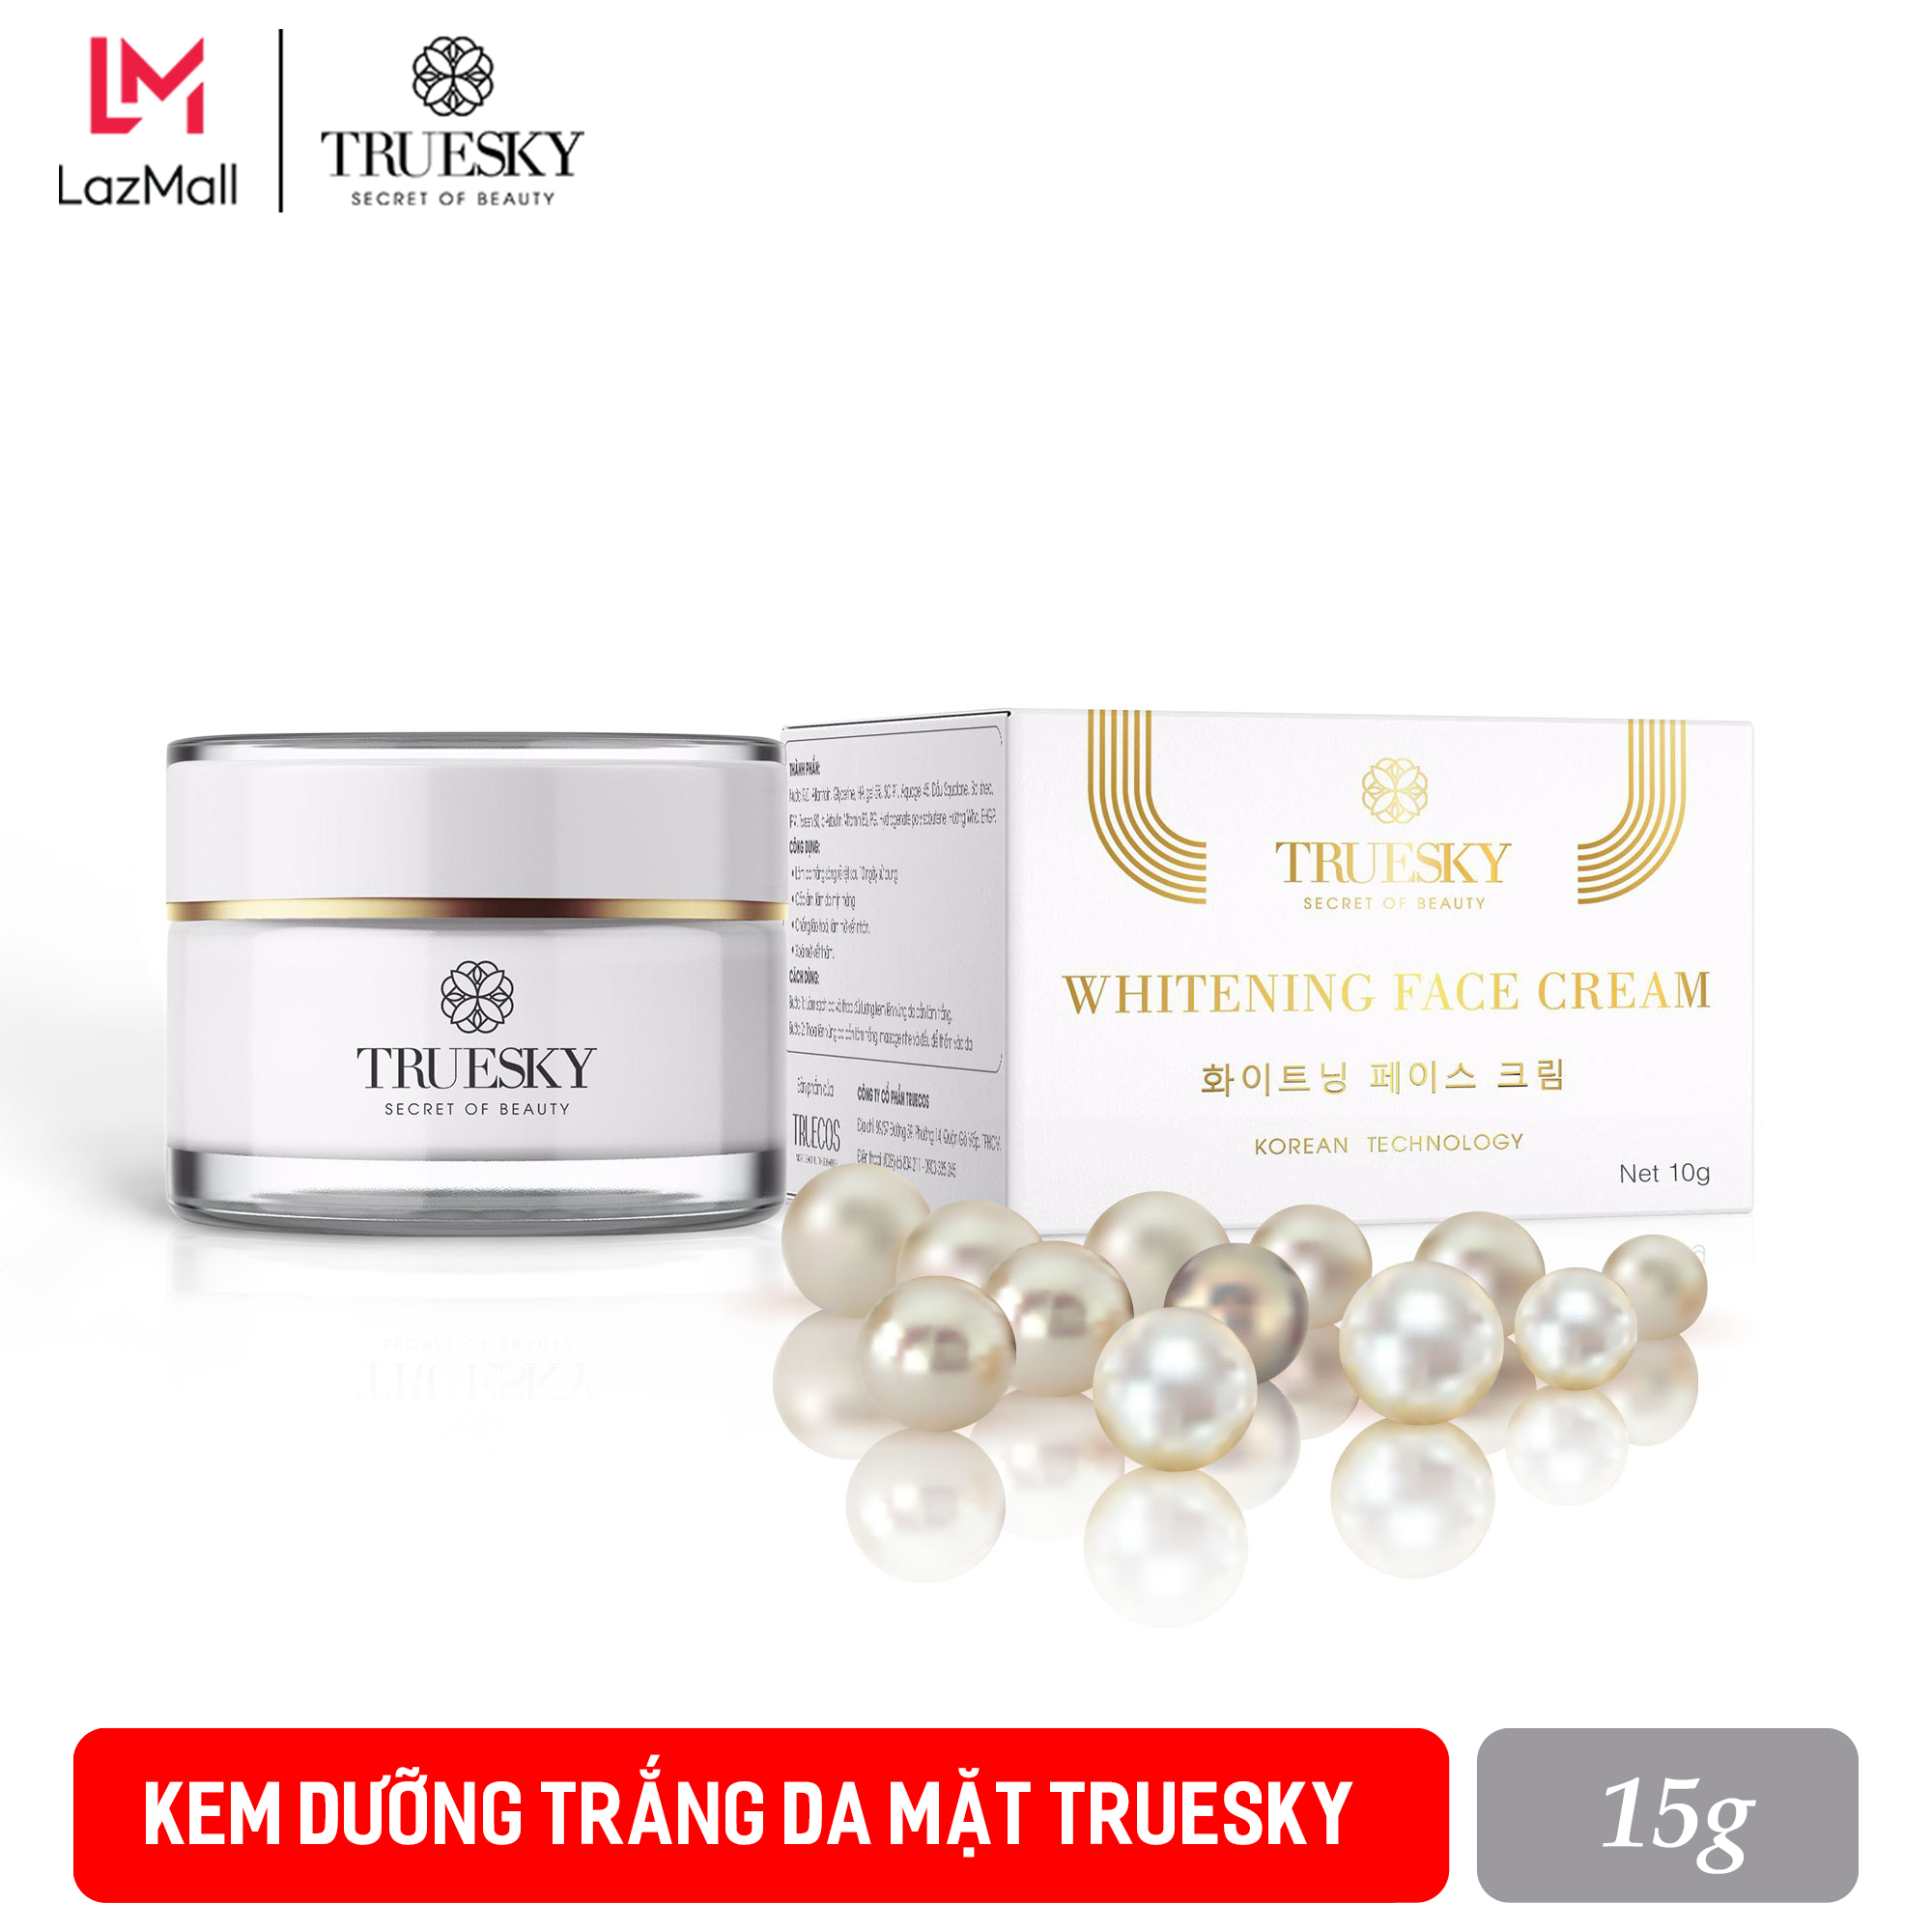 Kem dưỡng trắng da mặt Truesky dạng lotion thẩm thấu nhanh 15g – Whitening Face Cream